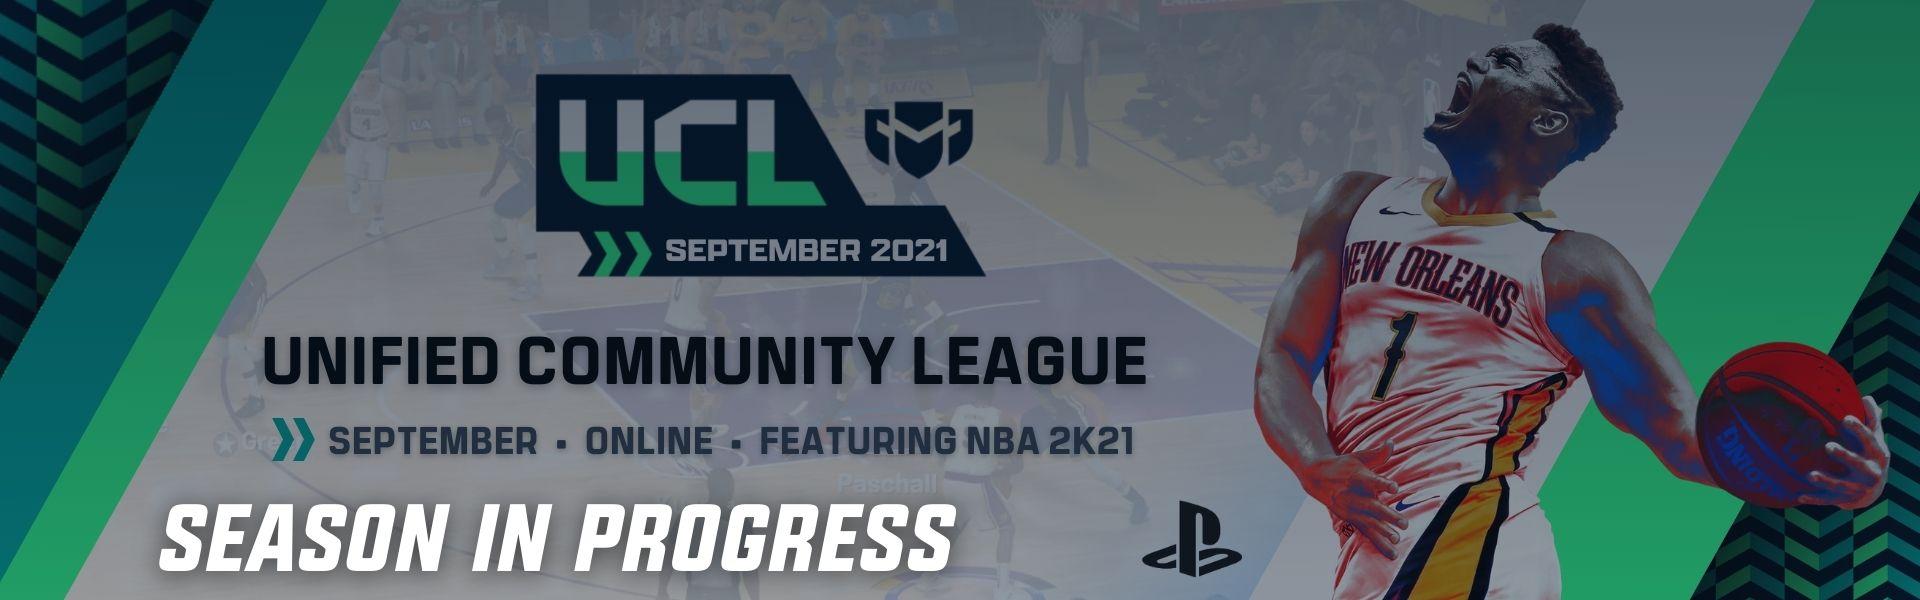 September UCL: Featuring NBA2K21 – PS4